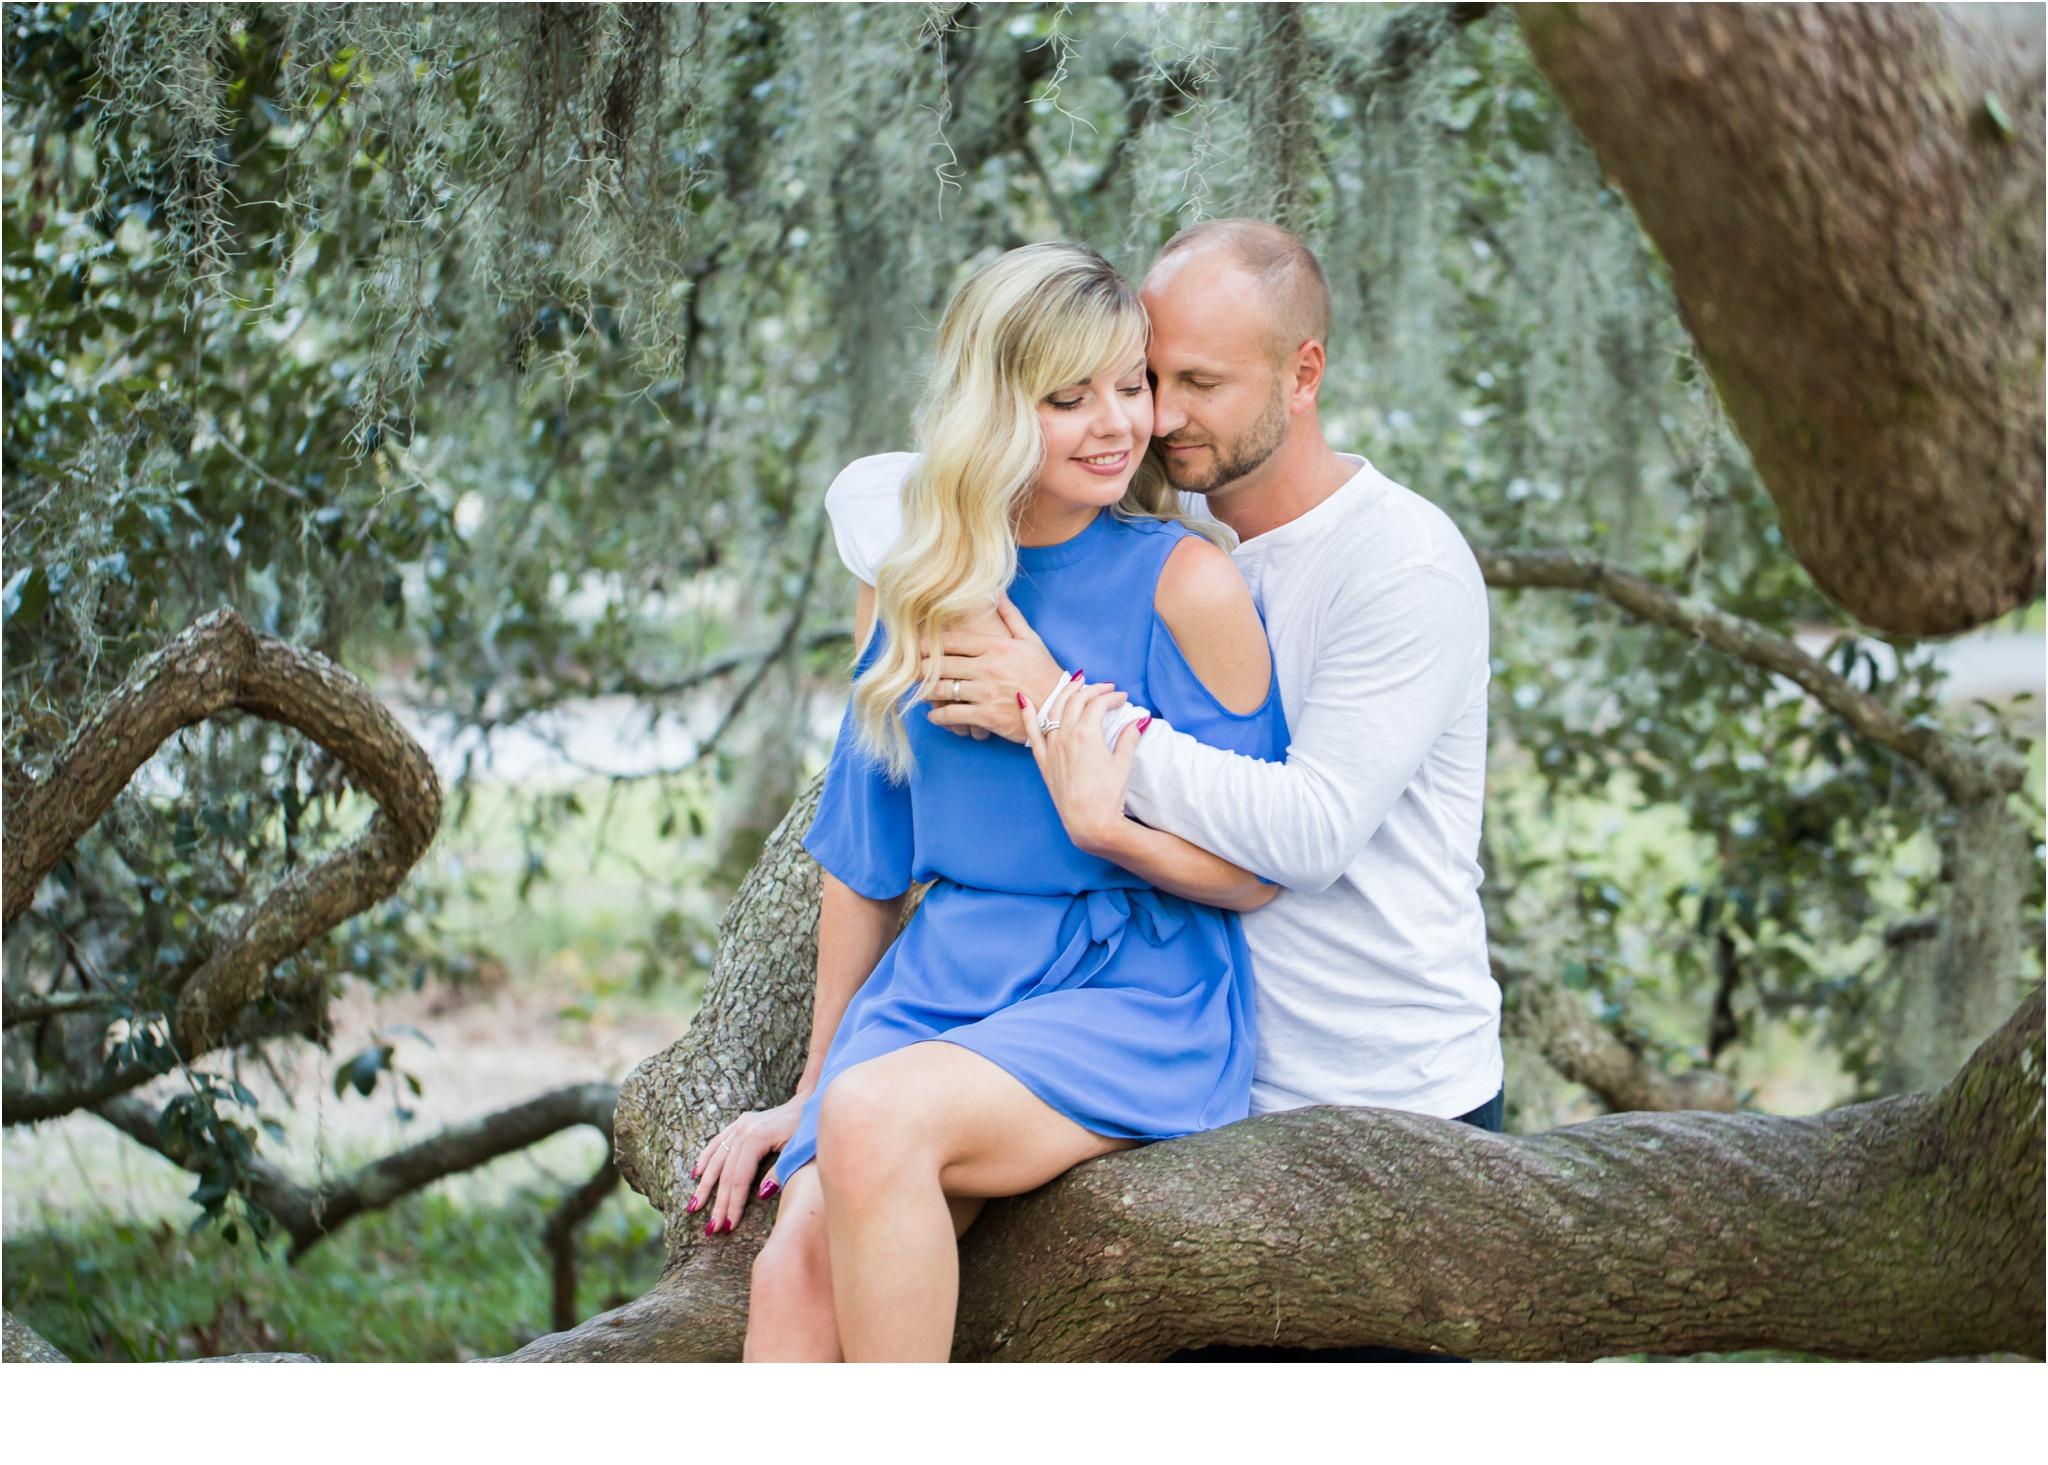 Rainey_Gregg_Photography_St._Simons_Island_Georgia_California_Wedding_Portrait_Photography_0264.jpg